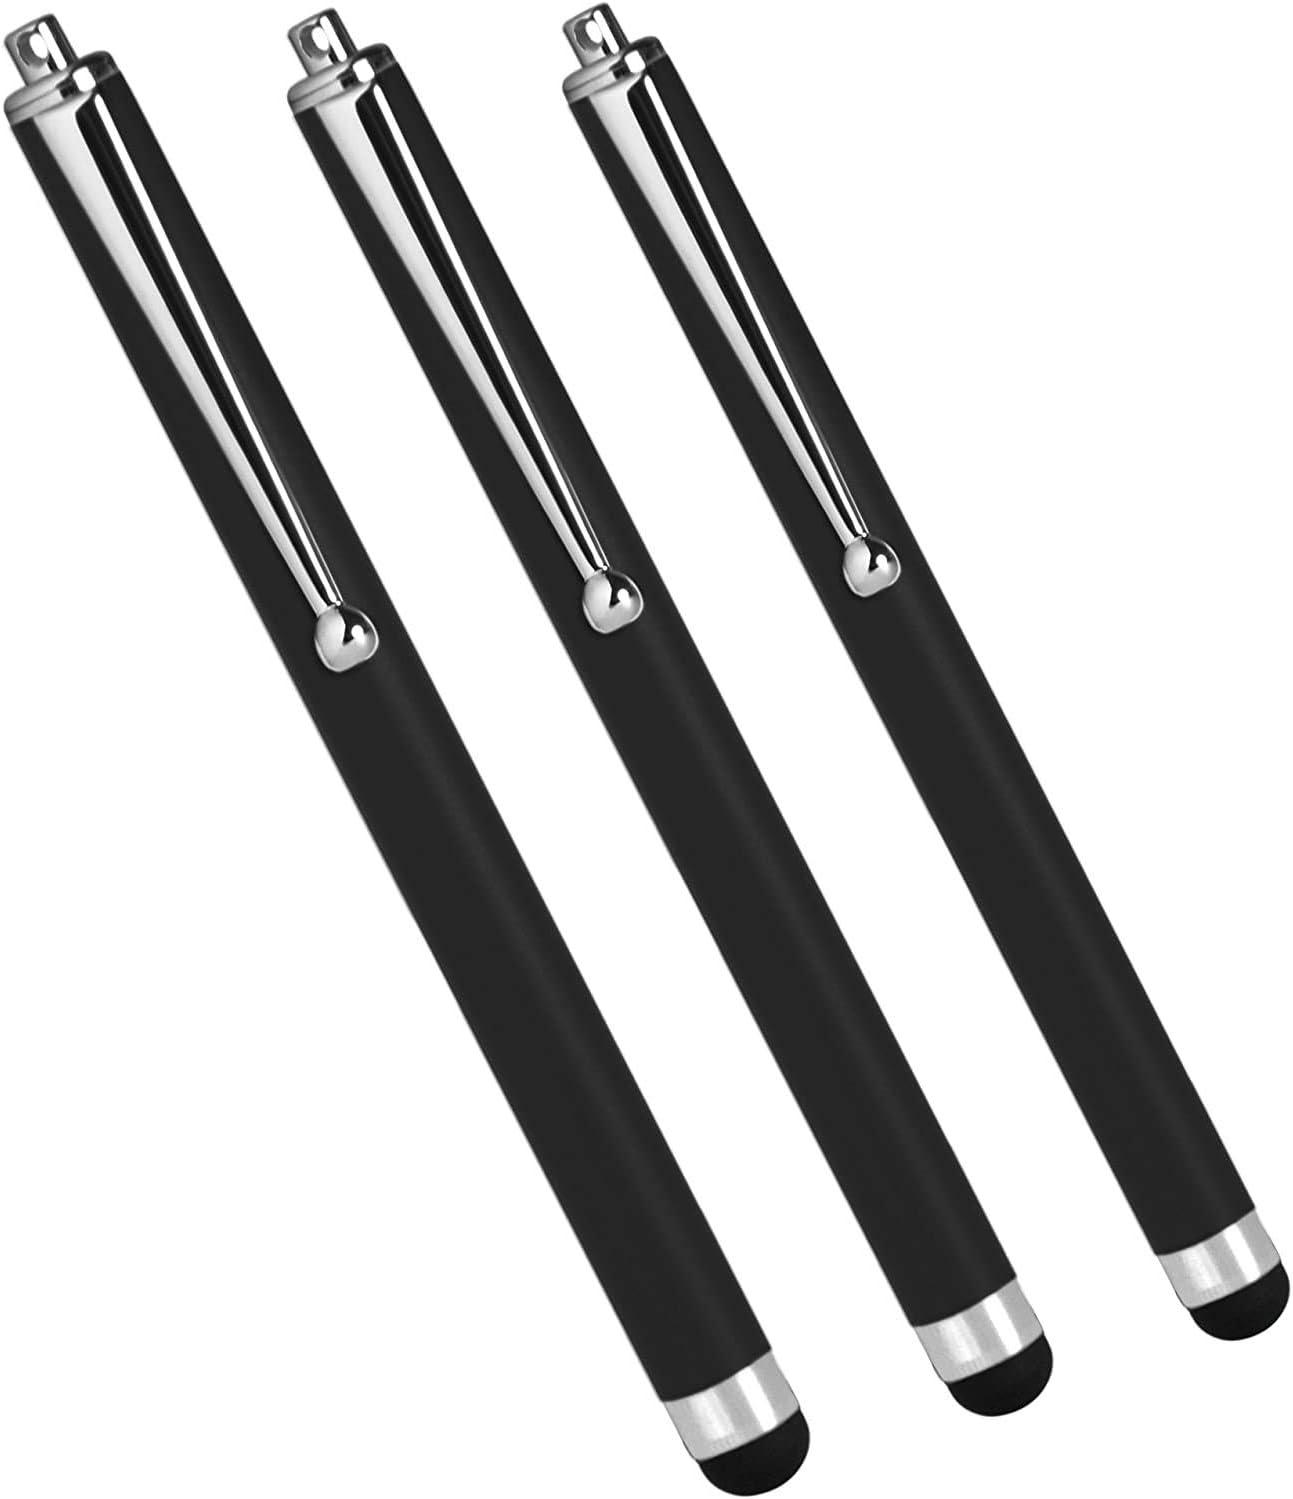 Dell Chromebook 11 (2015) Stylus Pen, BoxWave [Capacitive Stylus (3-Pack)] Stylus Pen Multi Pack for Dell Chromebook 11 (2015) - Jet Black